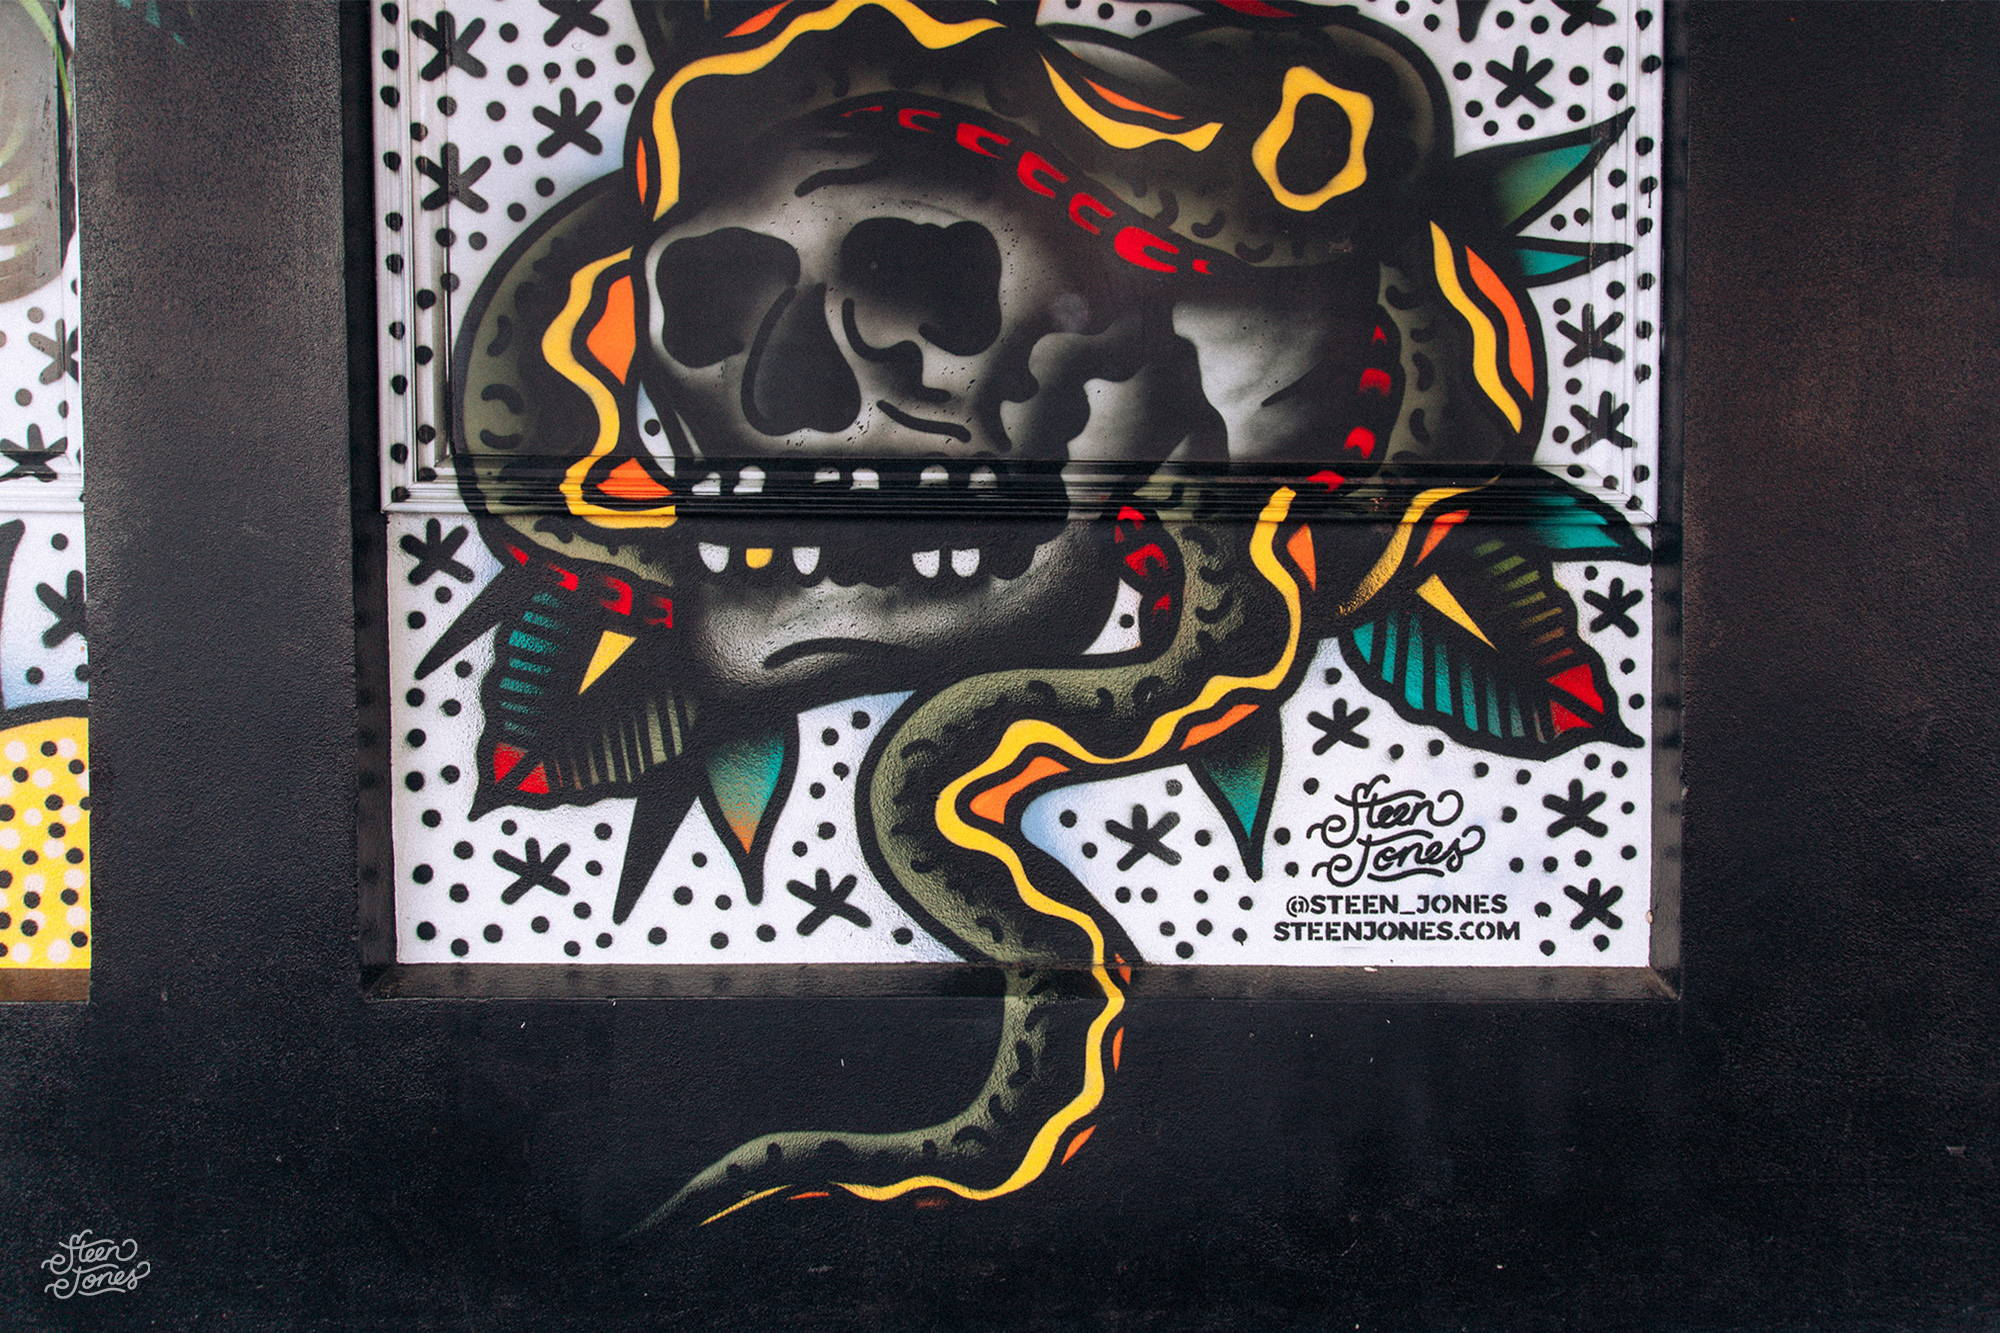 Steen Jones tattoo street artist MISHMOSH Ponsonby NZ mural